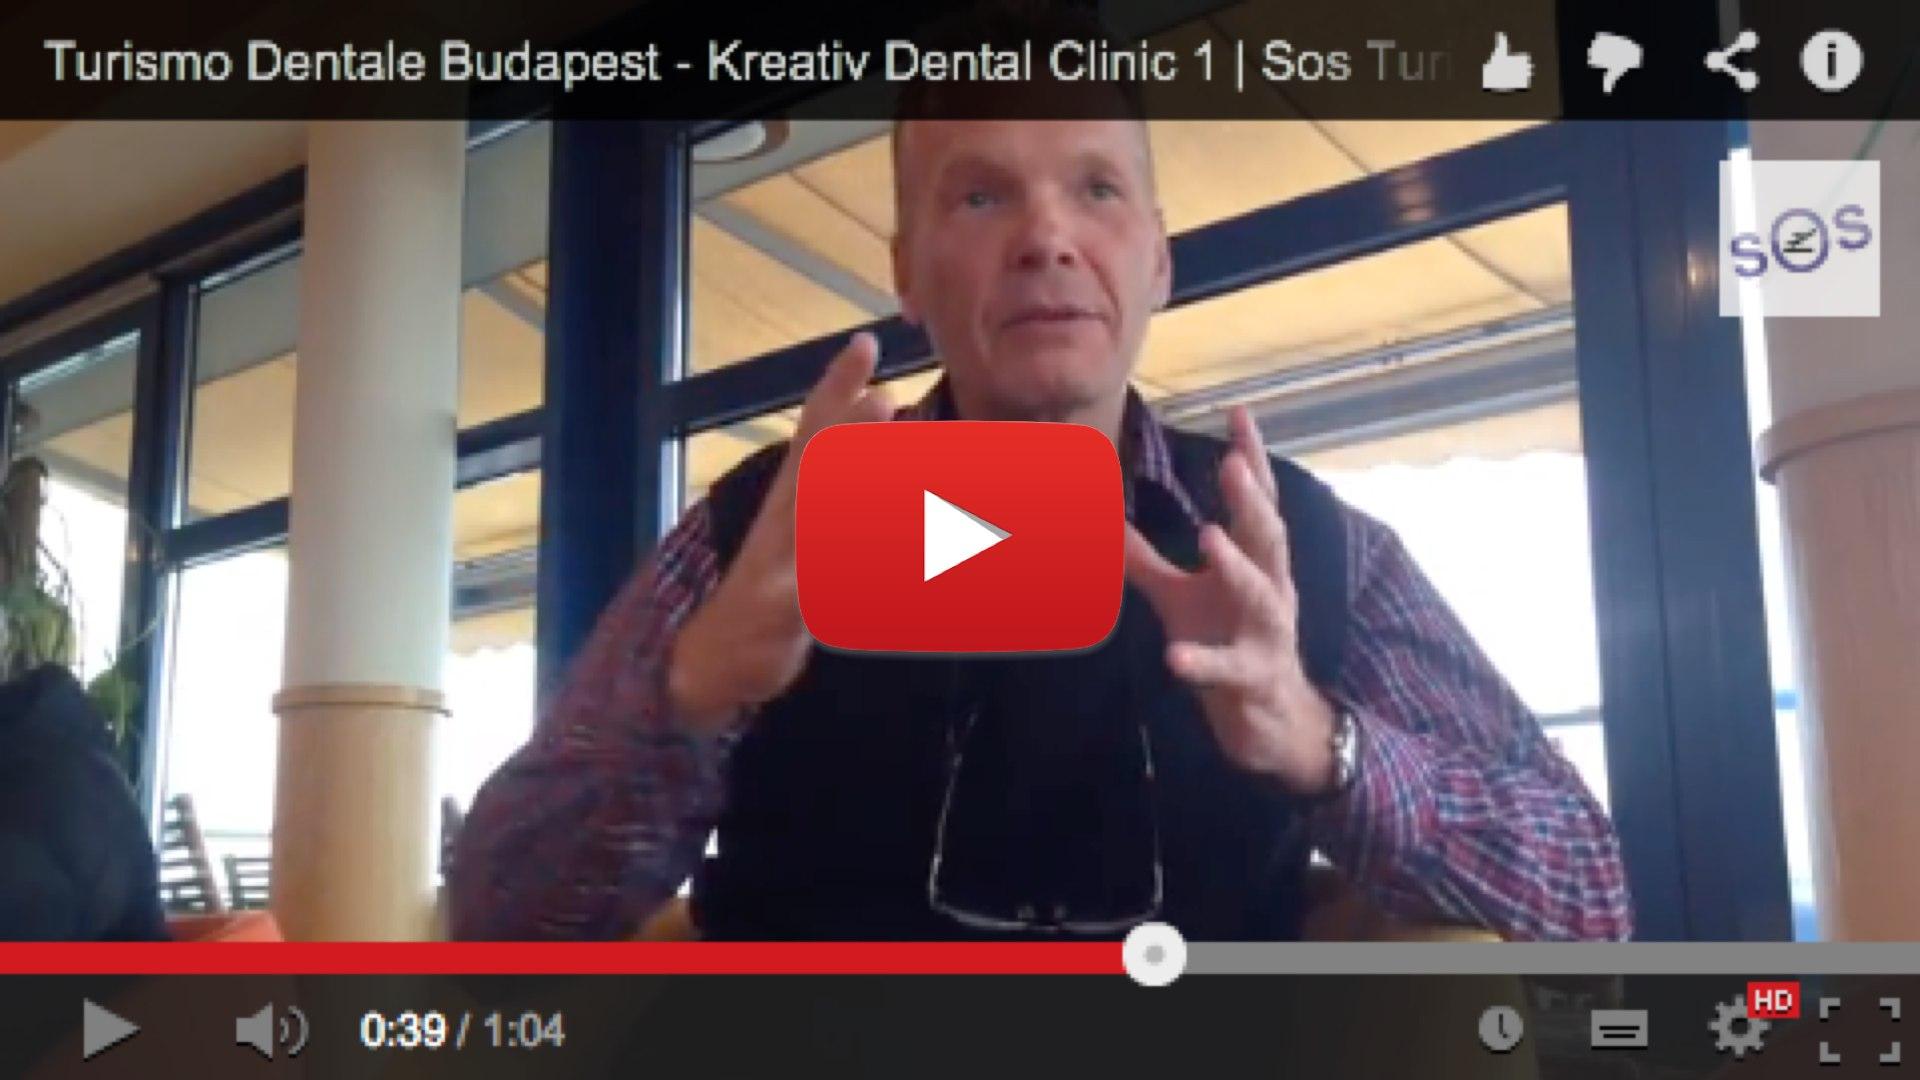 Turismo Dentale Budapest - Kreativ Dental